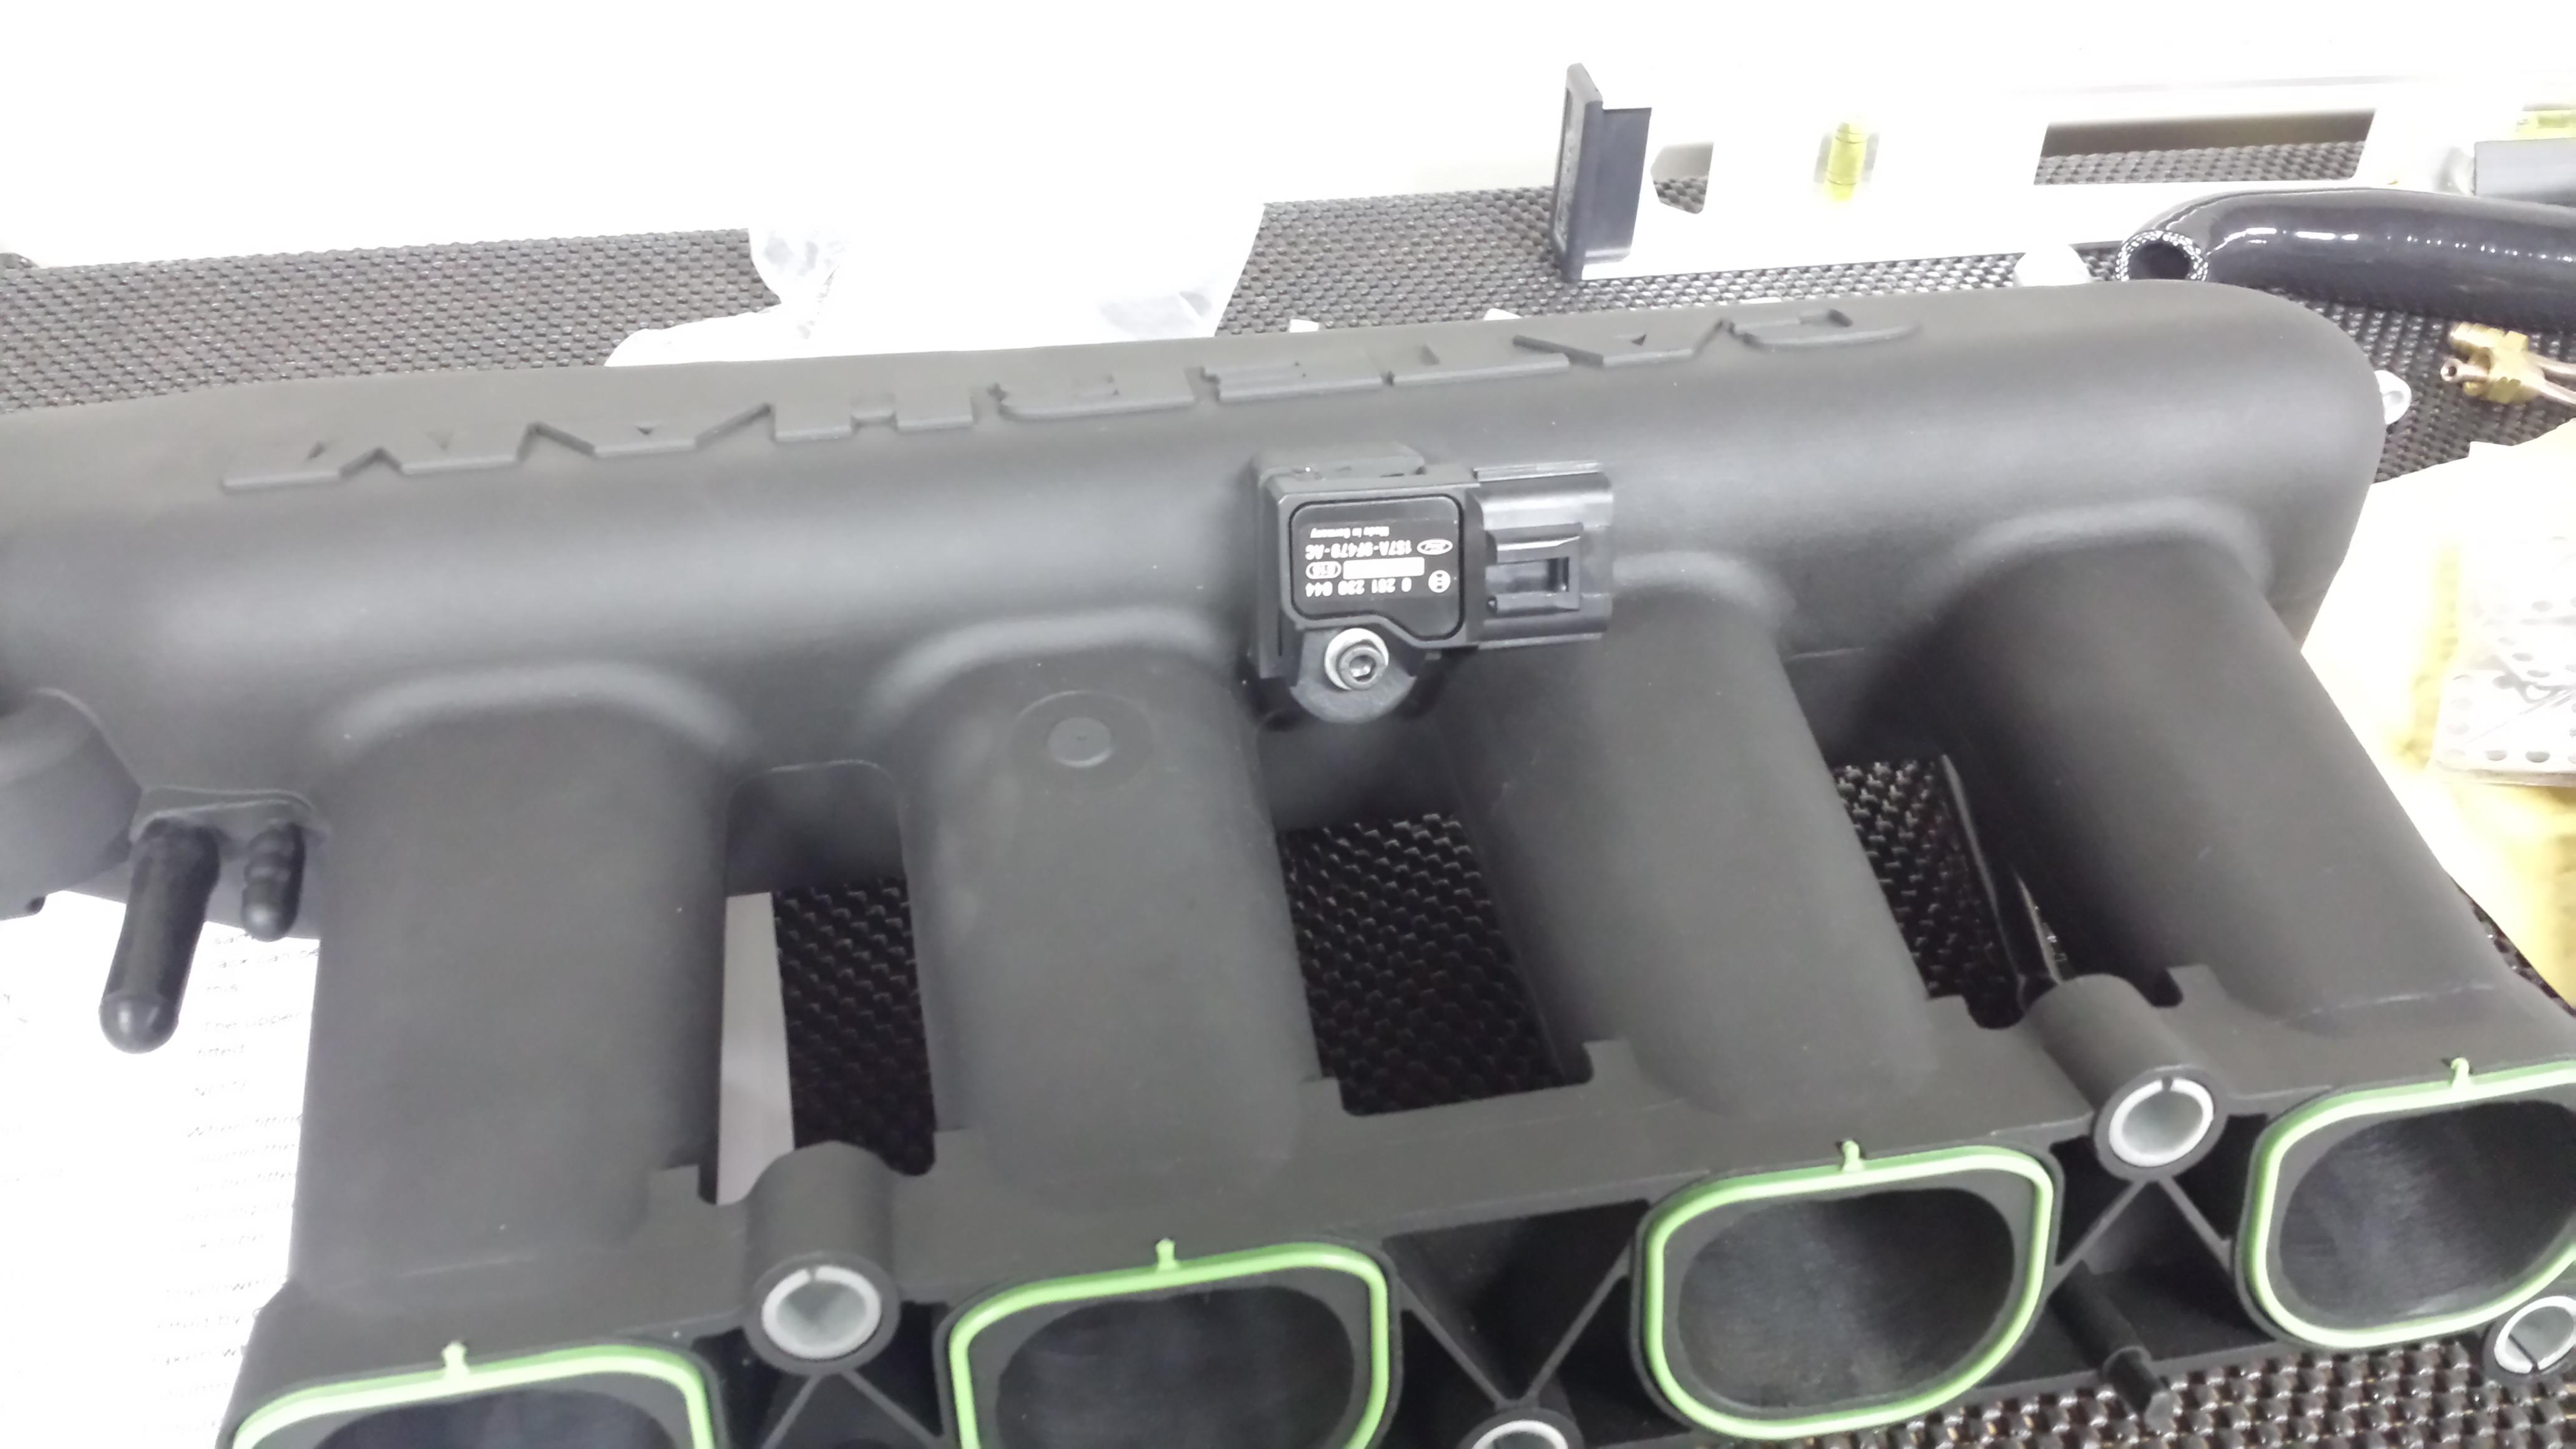 Intake plenum with sensor